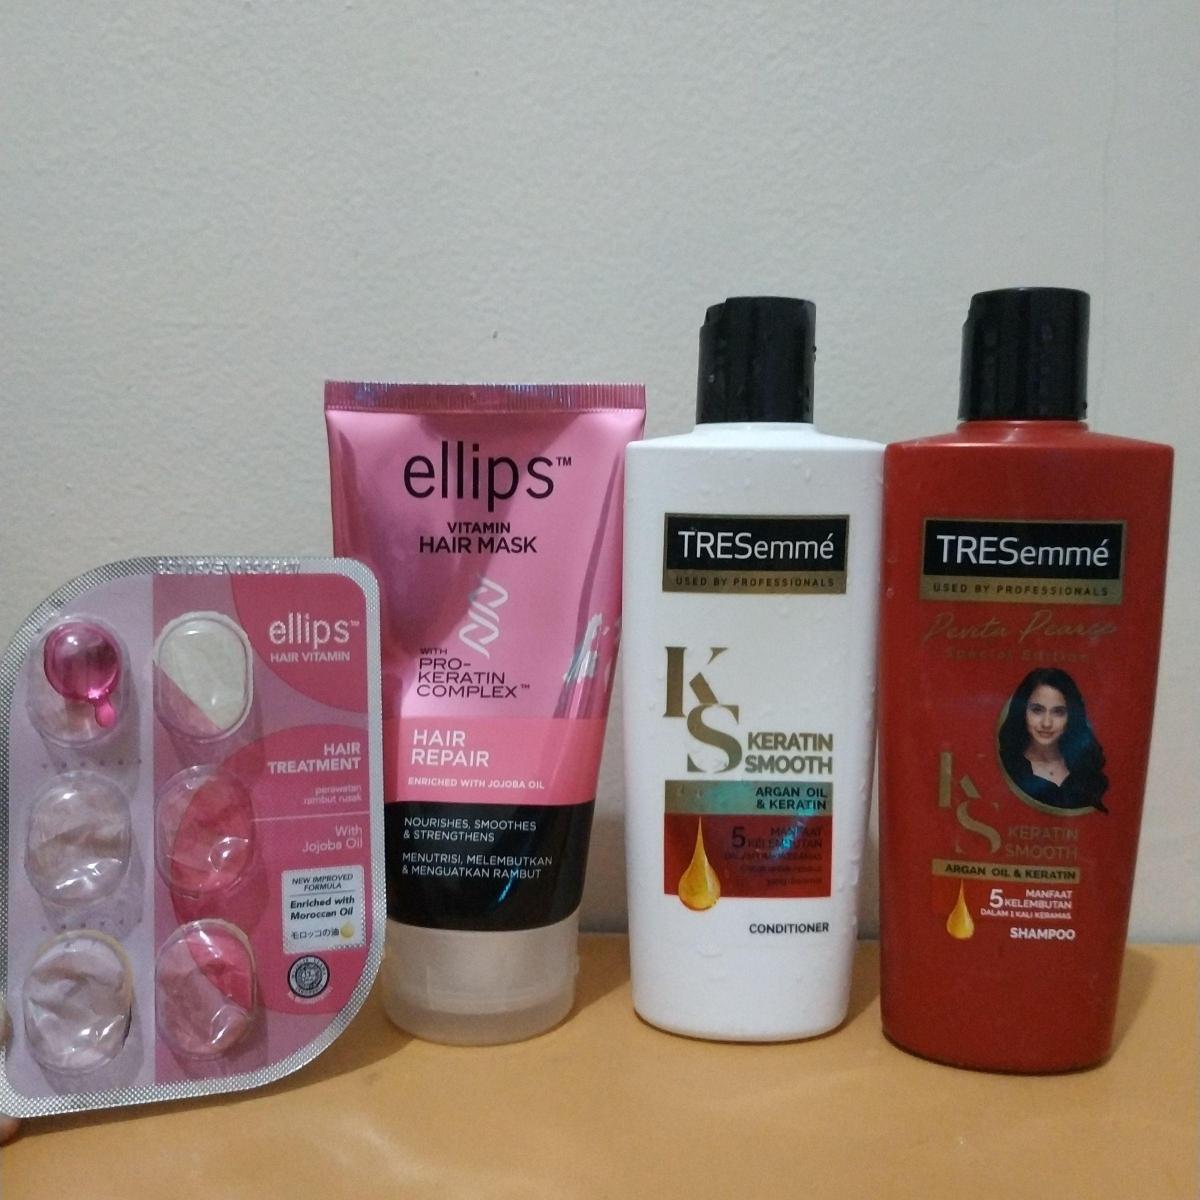 Ellips Vitamin Hair Mask Hair Repair Review Female Daily